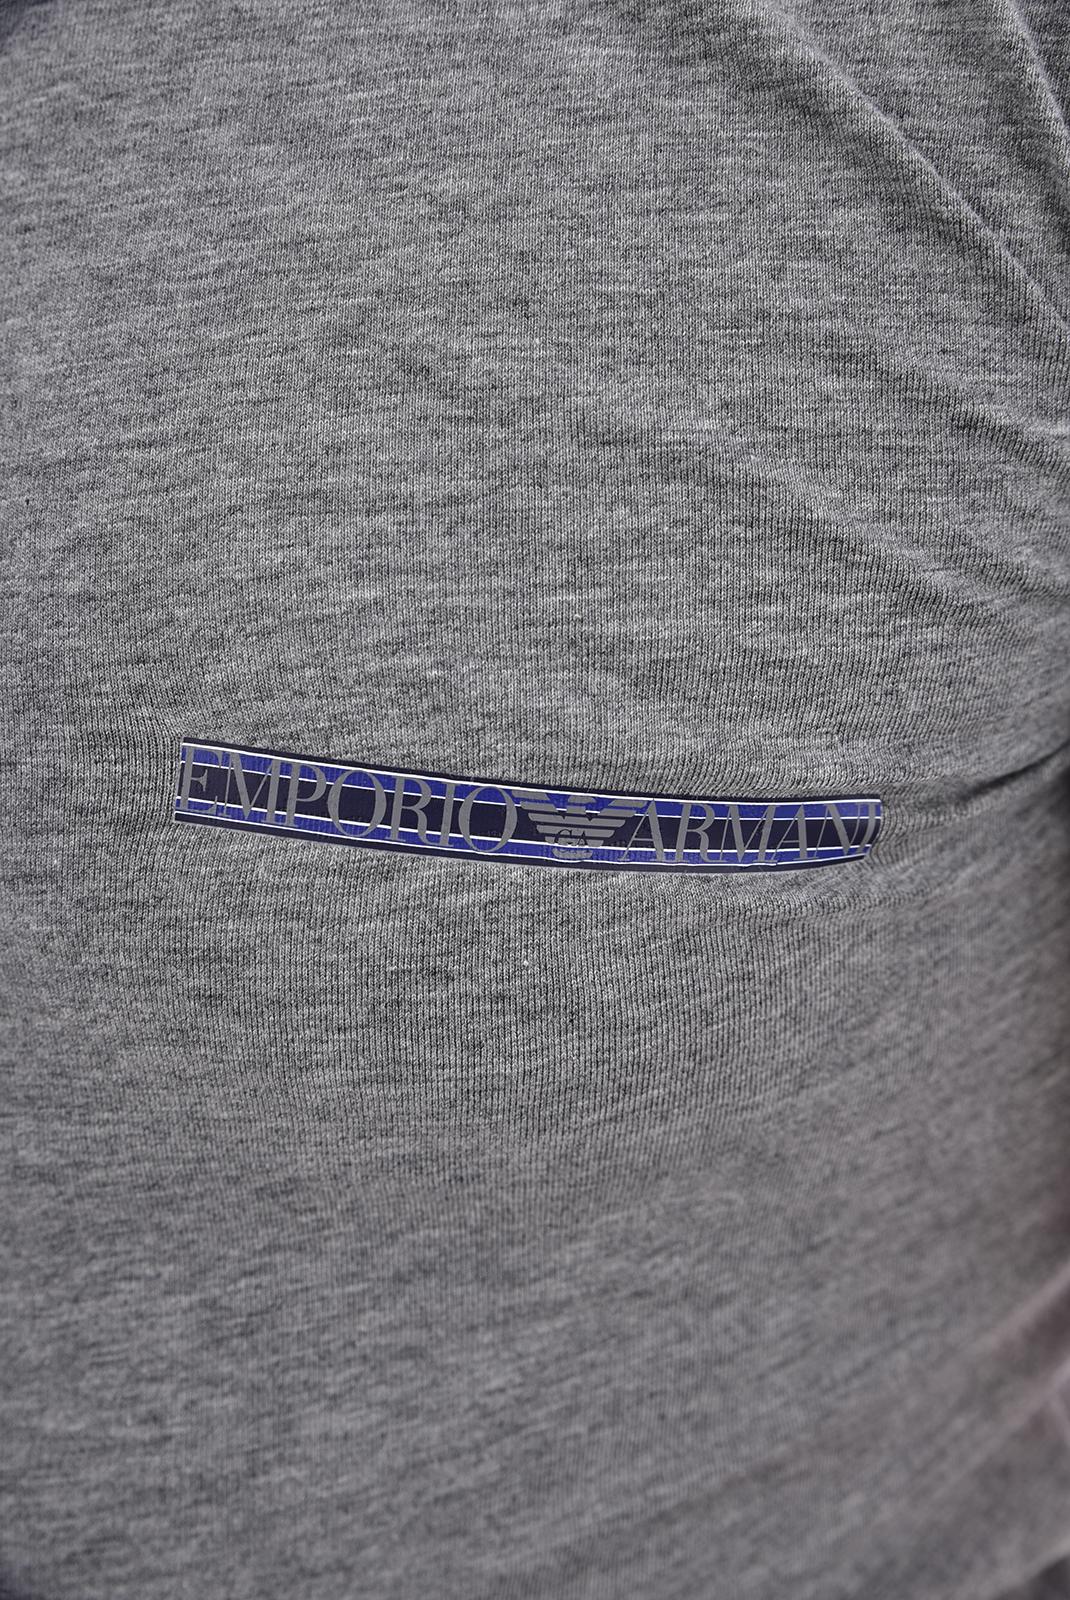 T-S manches courtes  Emporio armani 111035 8A525 06749 GRIGIO MELANGE SCURO